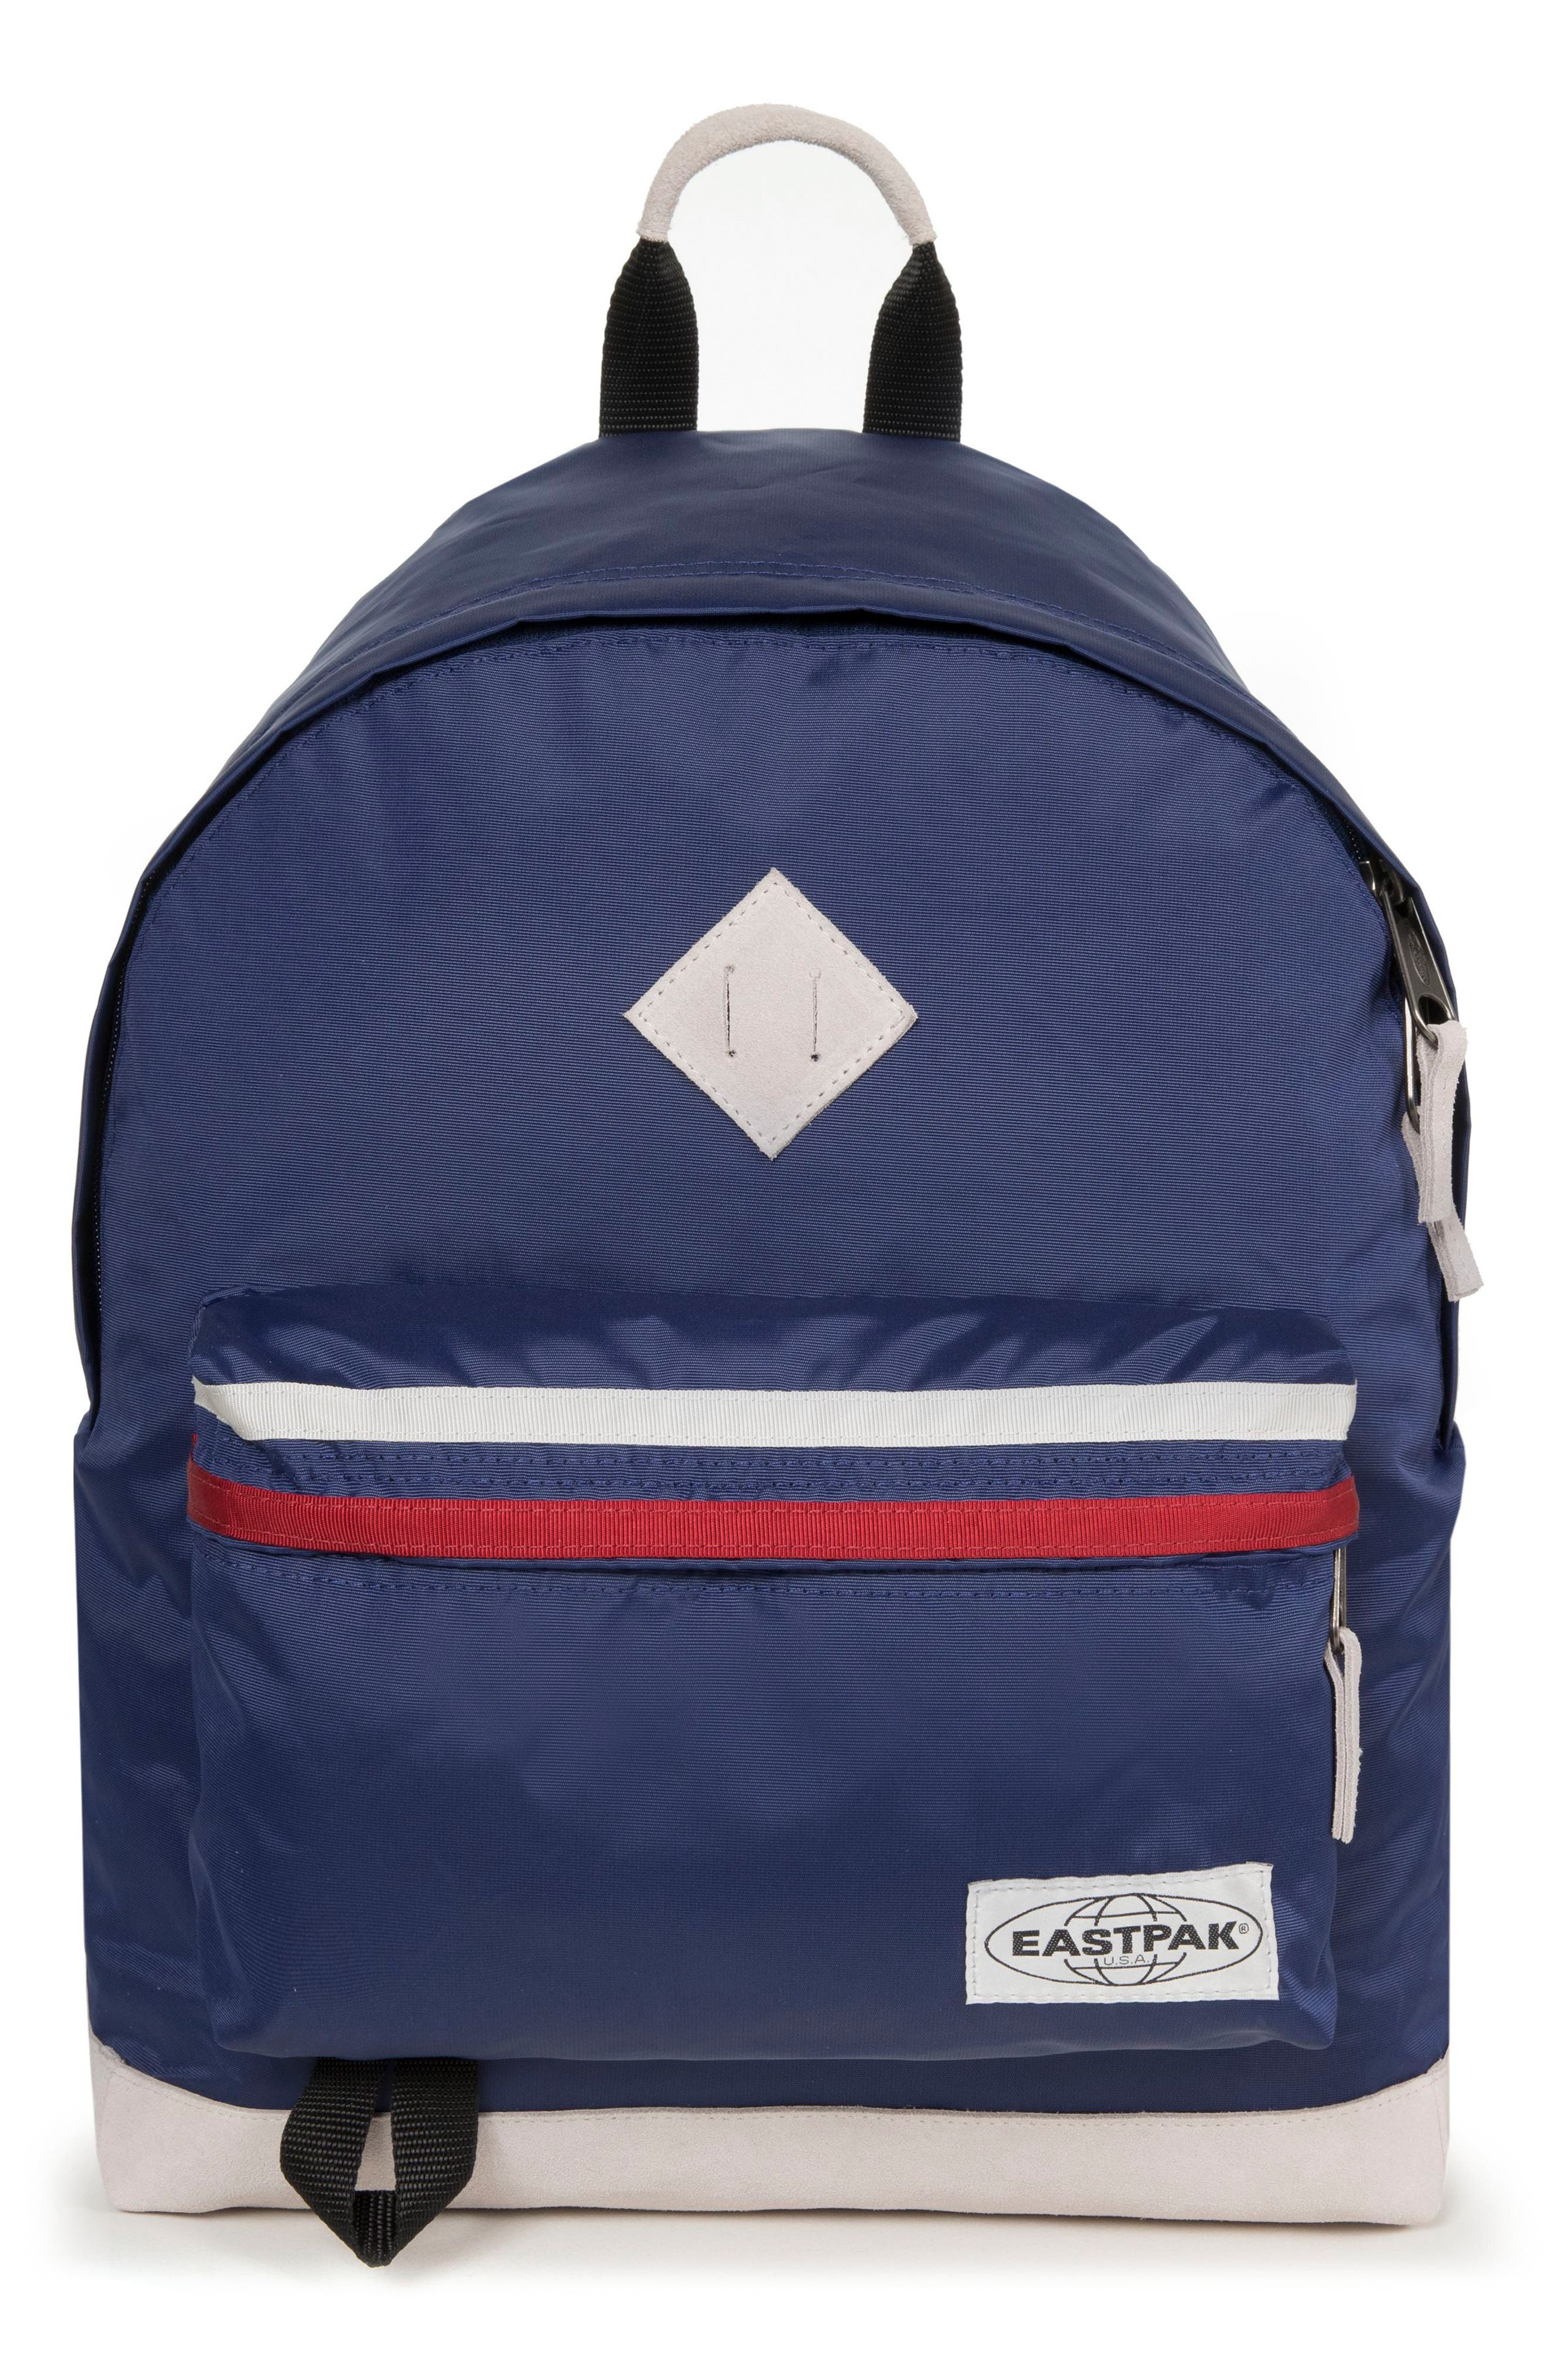 Eastpak Wyoming 13-Inch Laptop Backpack - Blue